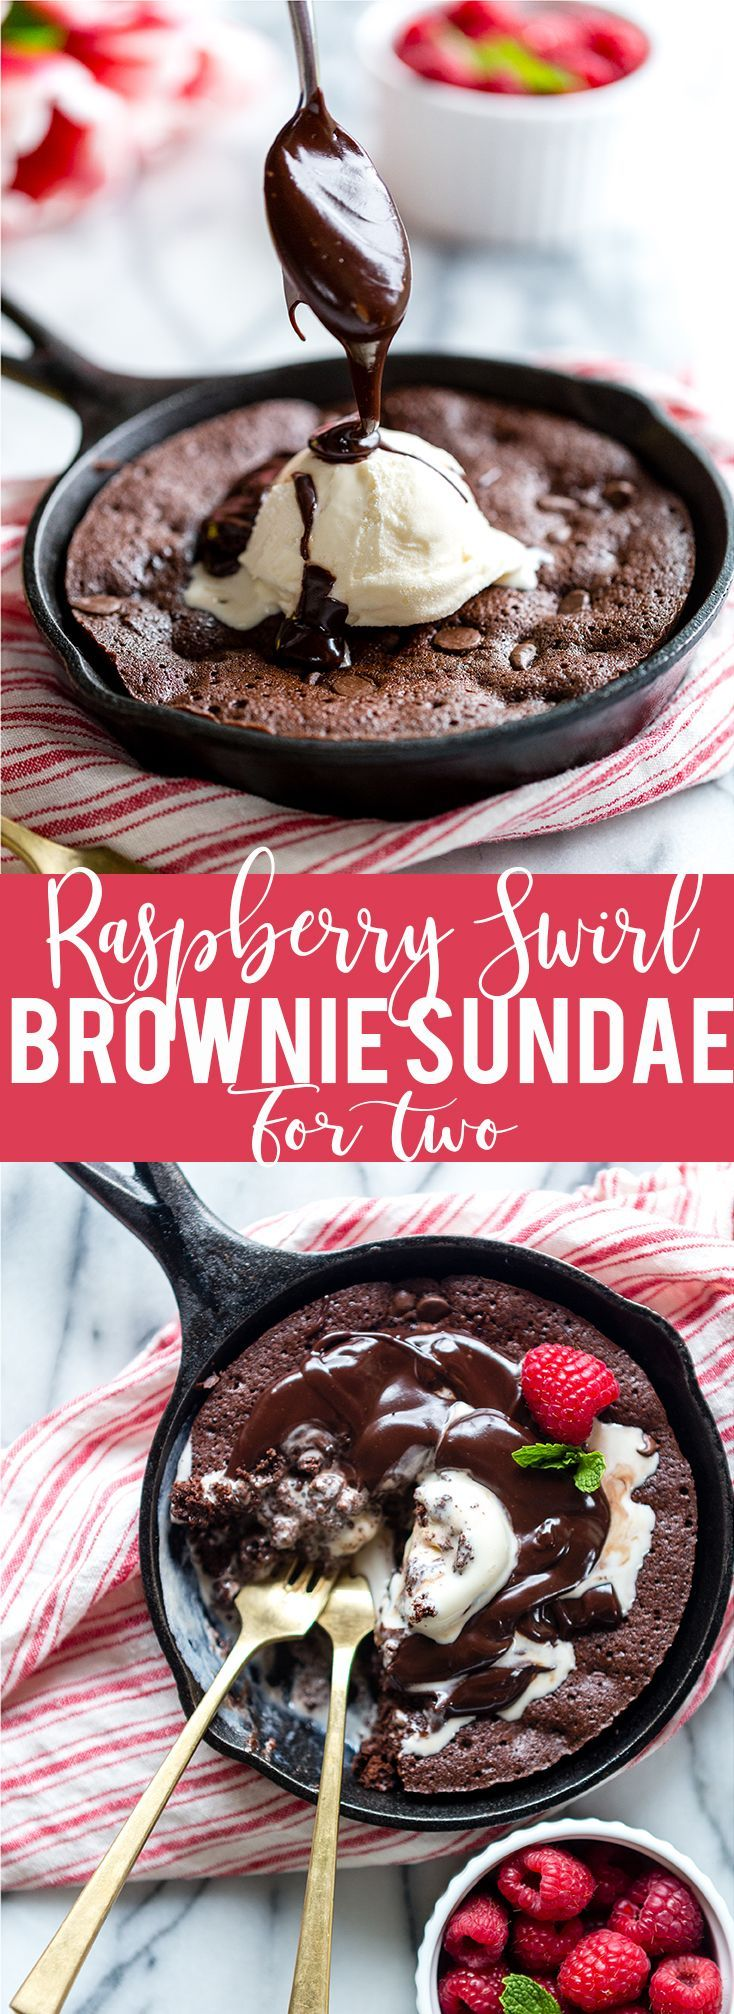 Raspberry Swirl Brownie Sundae